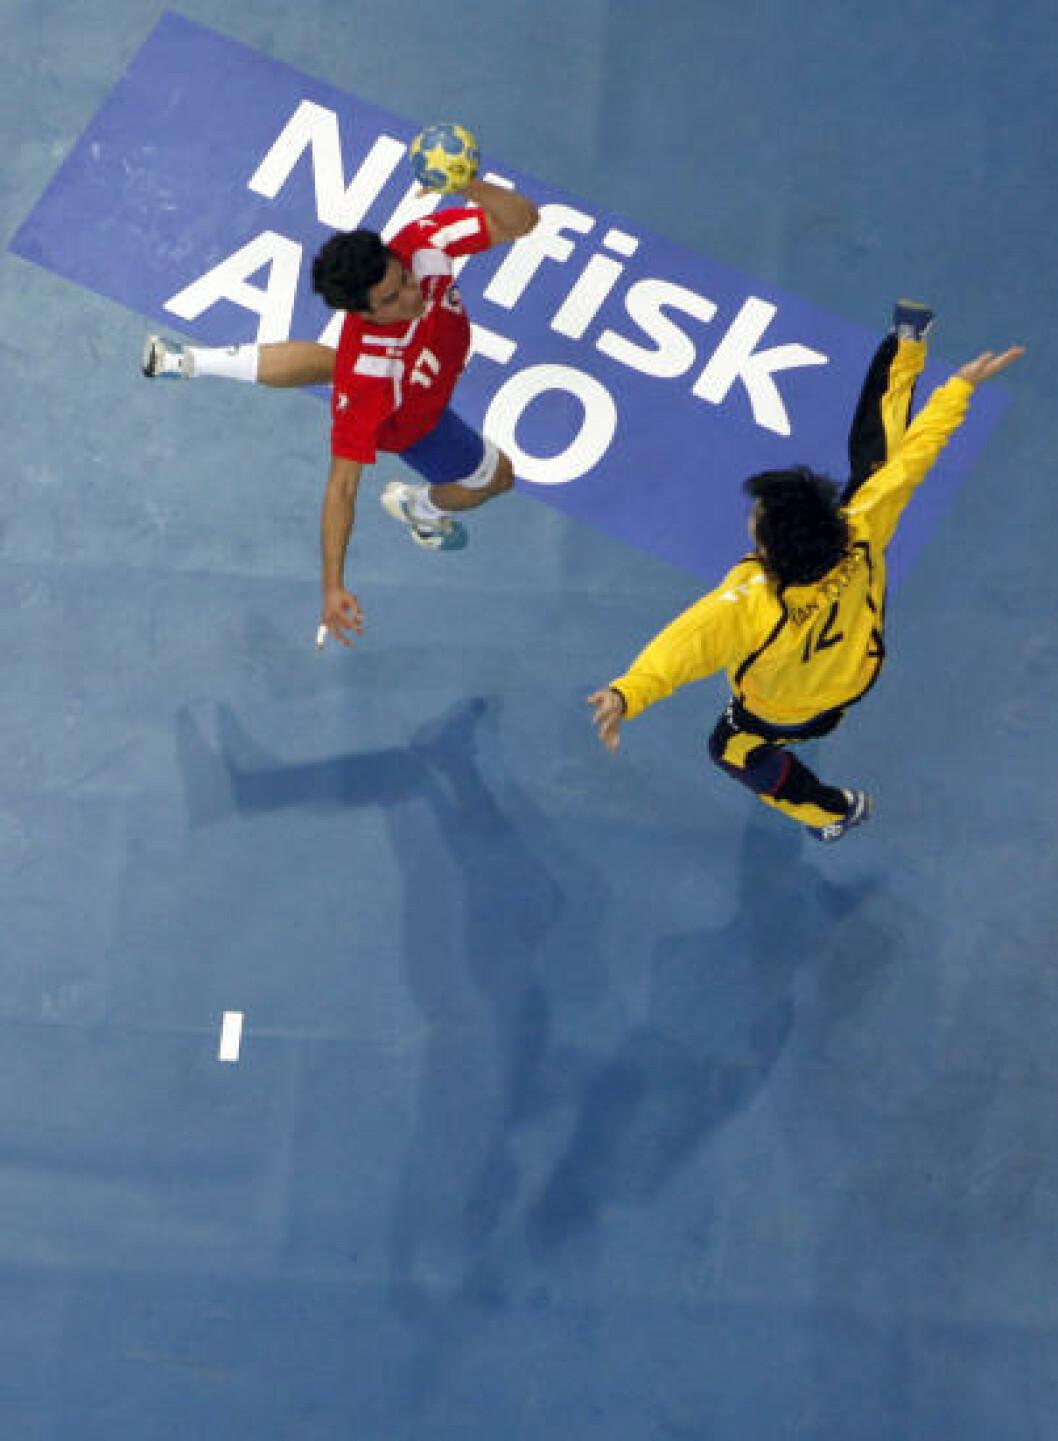 Chile mot Sør-Korea i Skandinavium i Göteborg. Foto: REUTERS/Umit Bektas